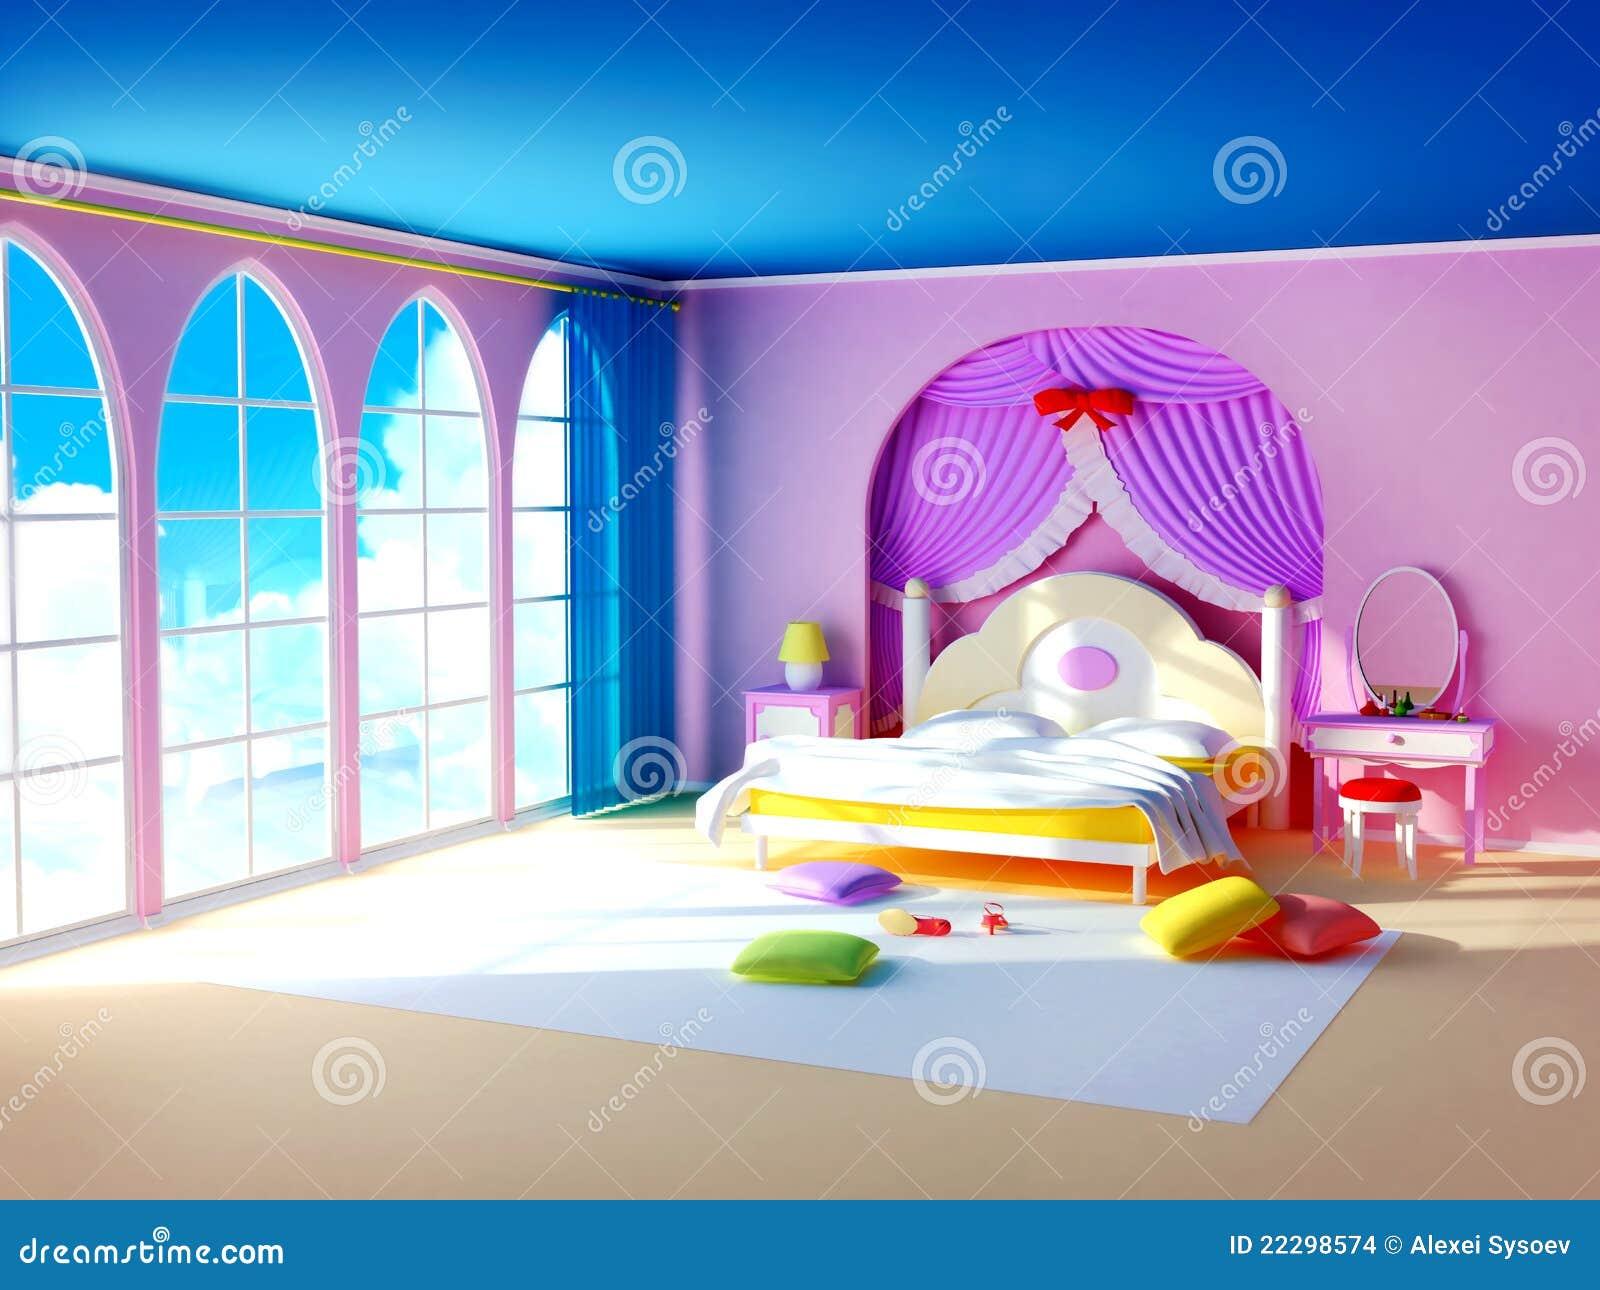 Fantasy Baby Room